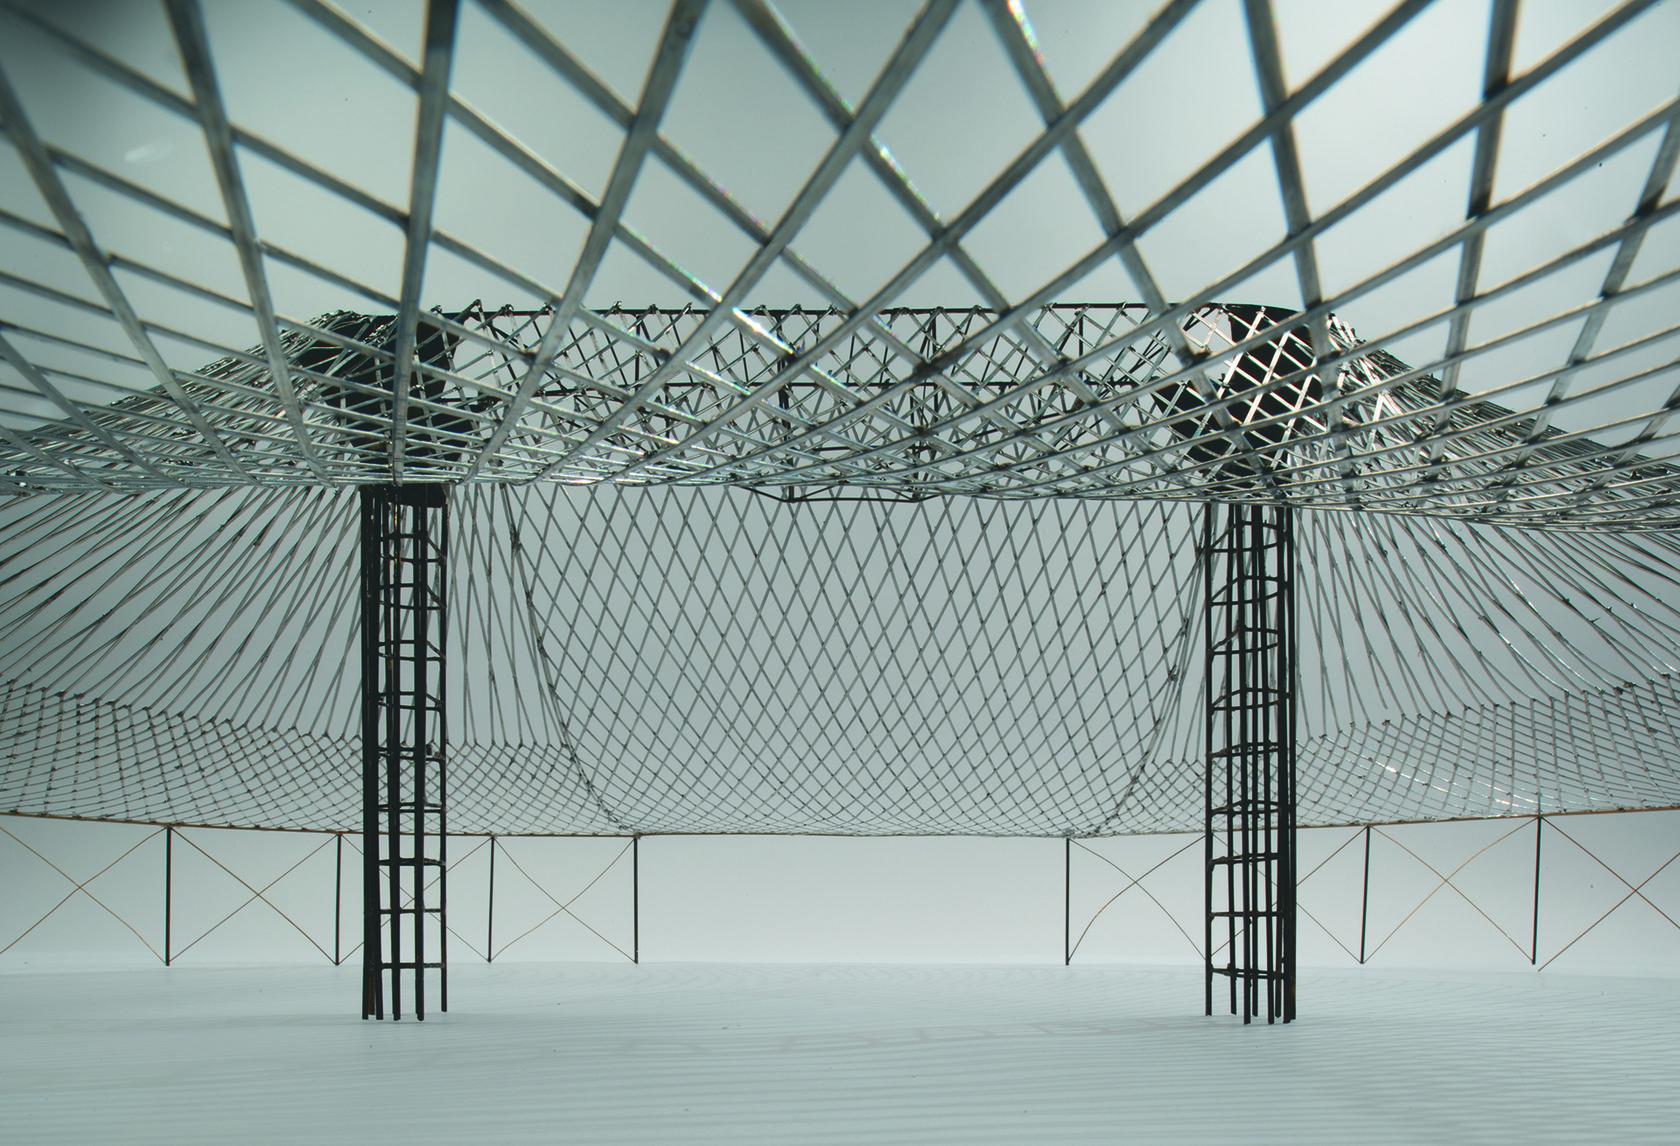 oval pavilion at All-Russia Exhibition in Nizhny Novgorod